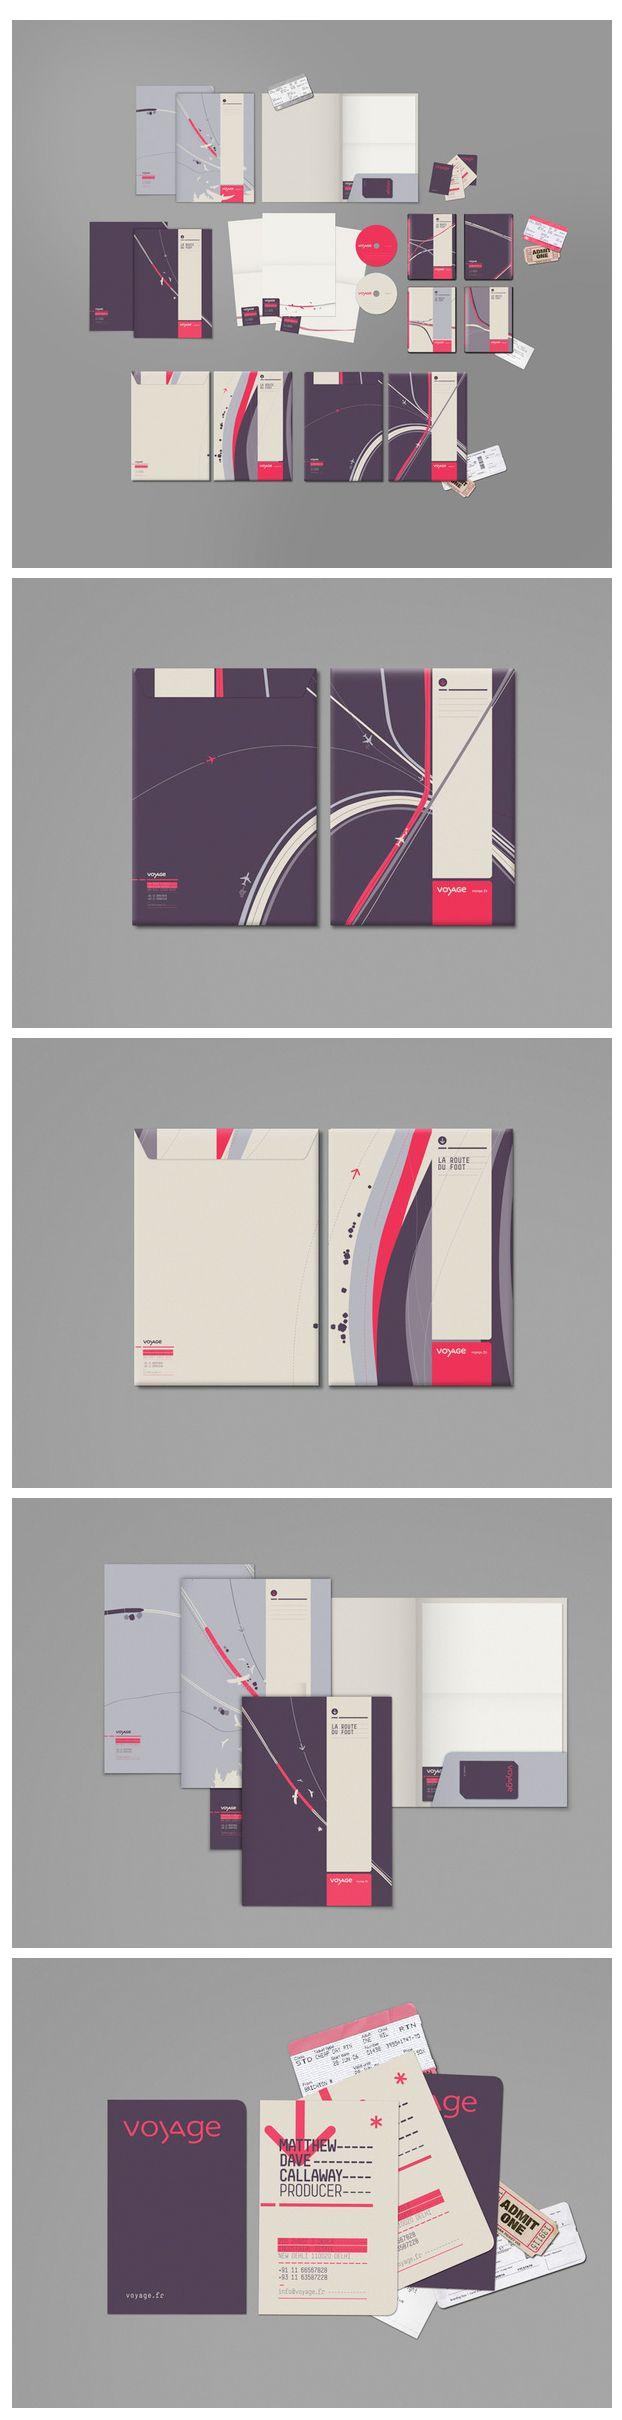 Gonzales Nogues | #stationary #corporate #design #corporatedesign #identity #branding #marketing < repinned by www.BlickeDeeler.de | Take a look at www.LogoGestaltung-Hamburg.de